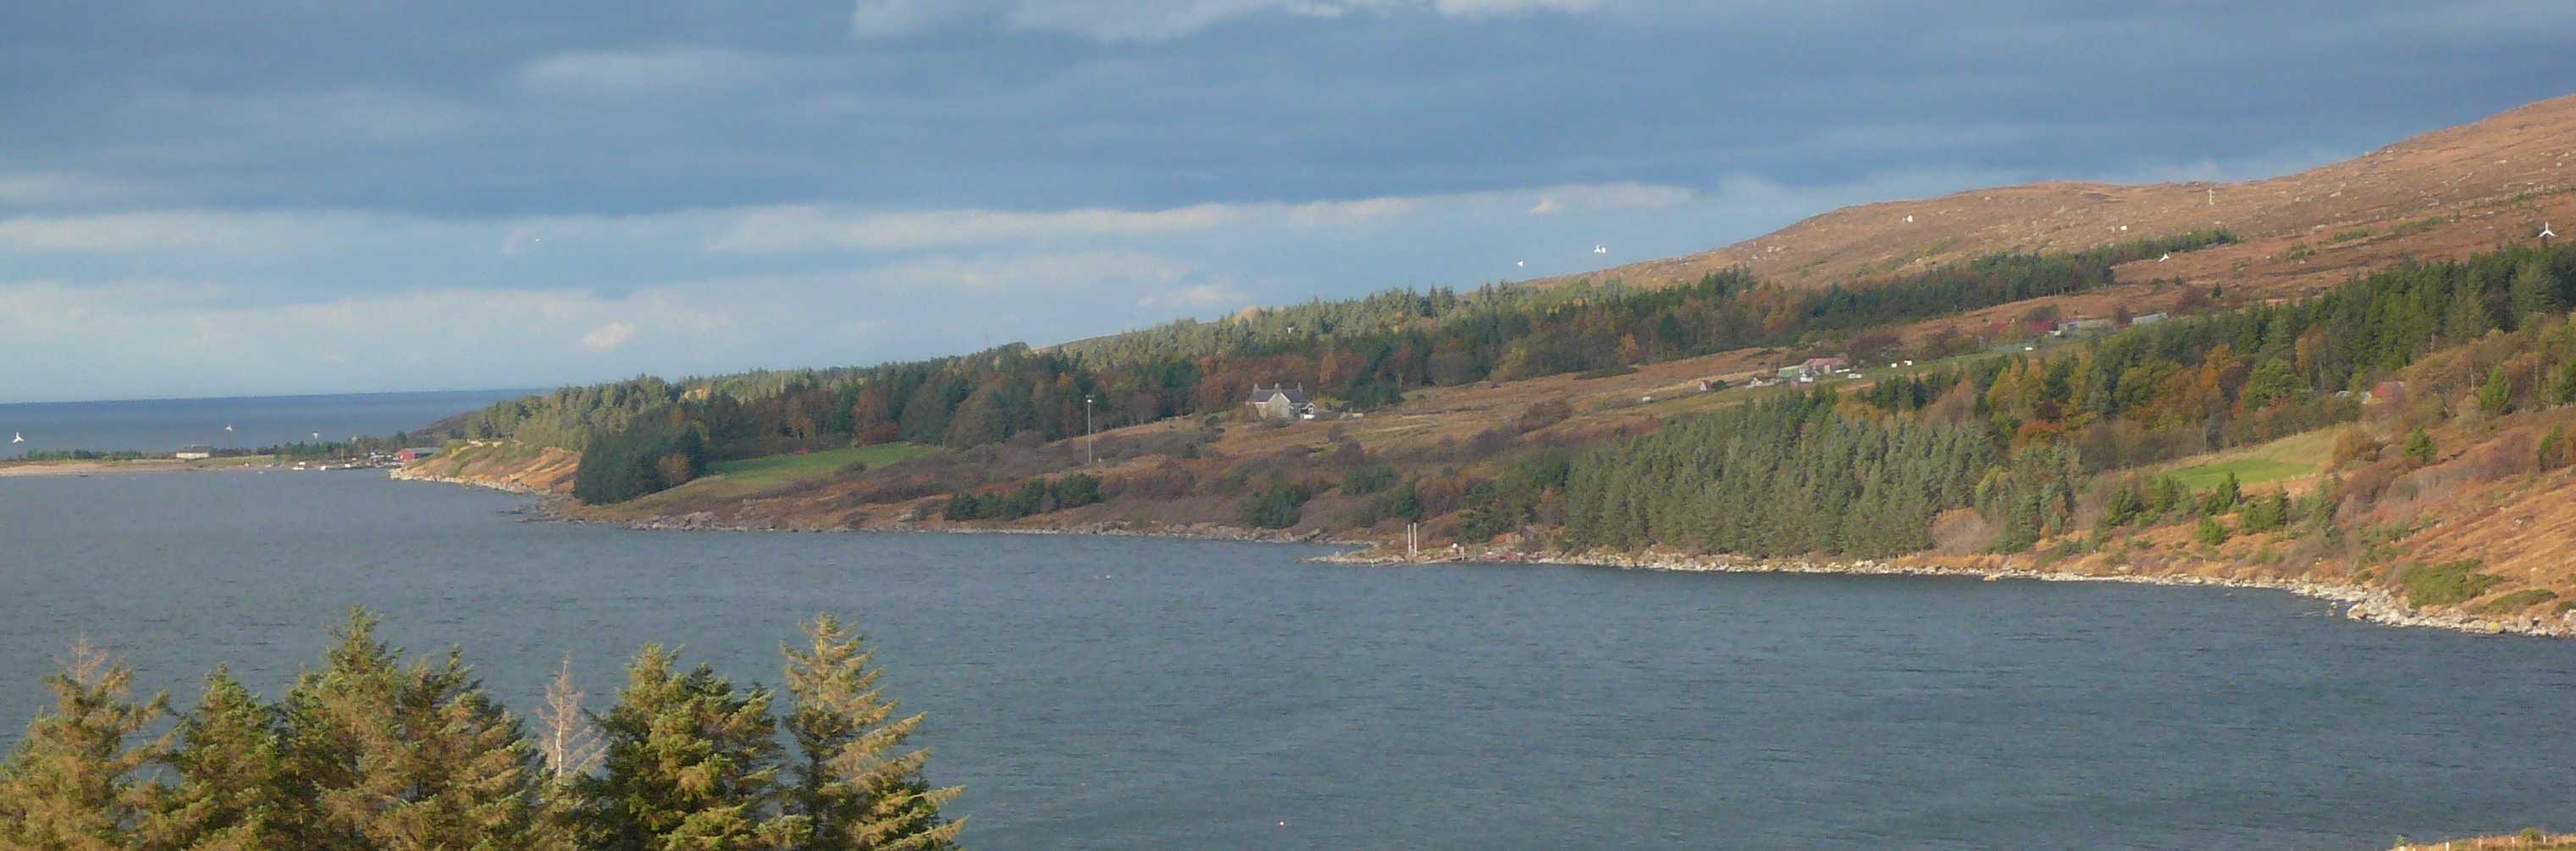 Scoraig peninsula